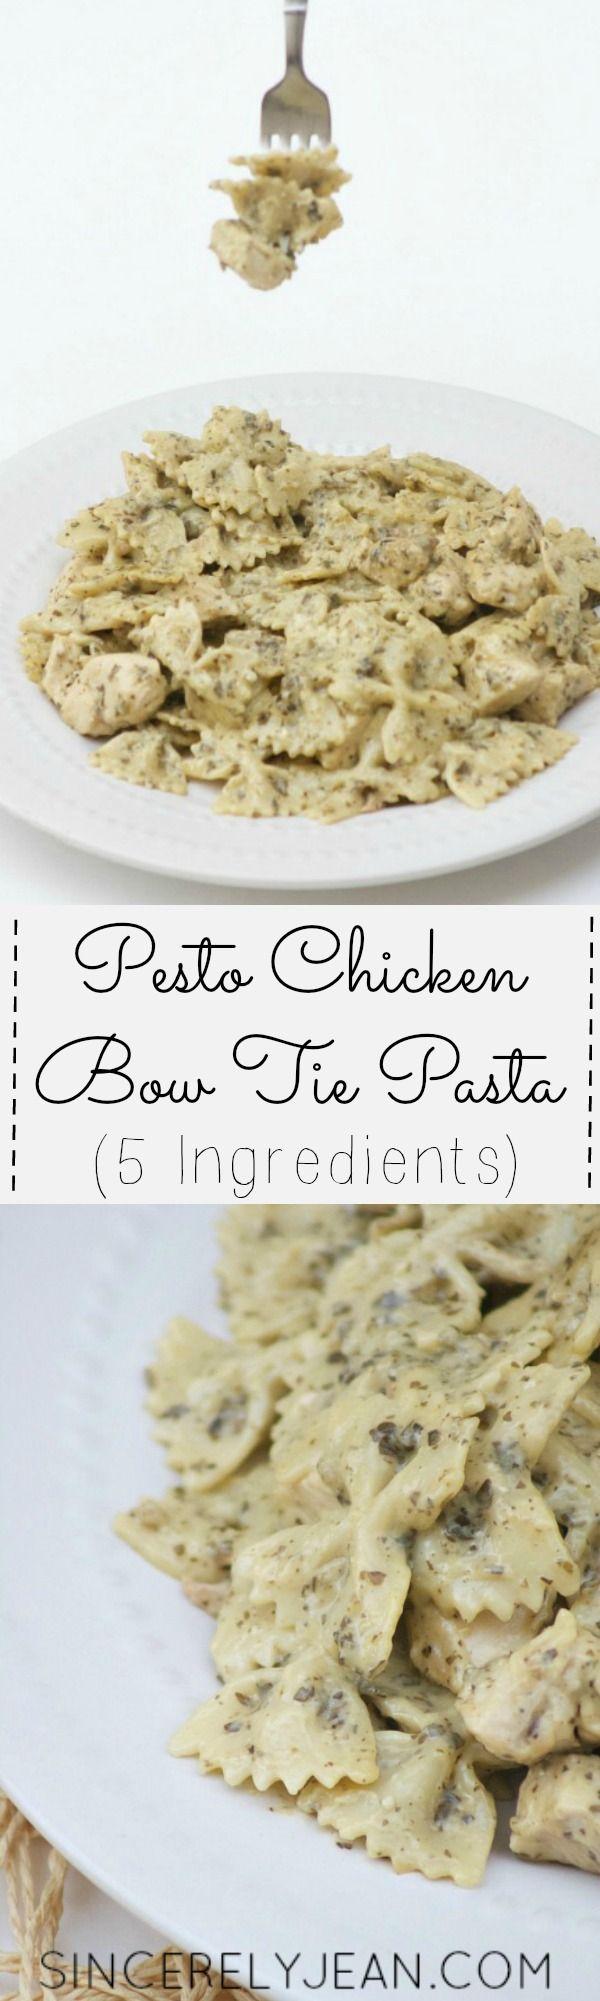 5 Ingredient Pesto Chicken Bow Tie Pasta - easy and quick dinner recipe! | www.sincerelyjean.com